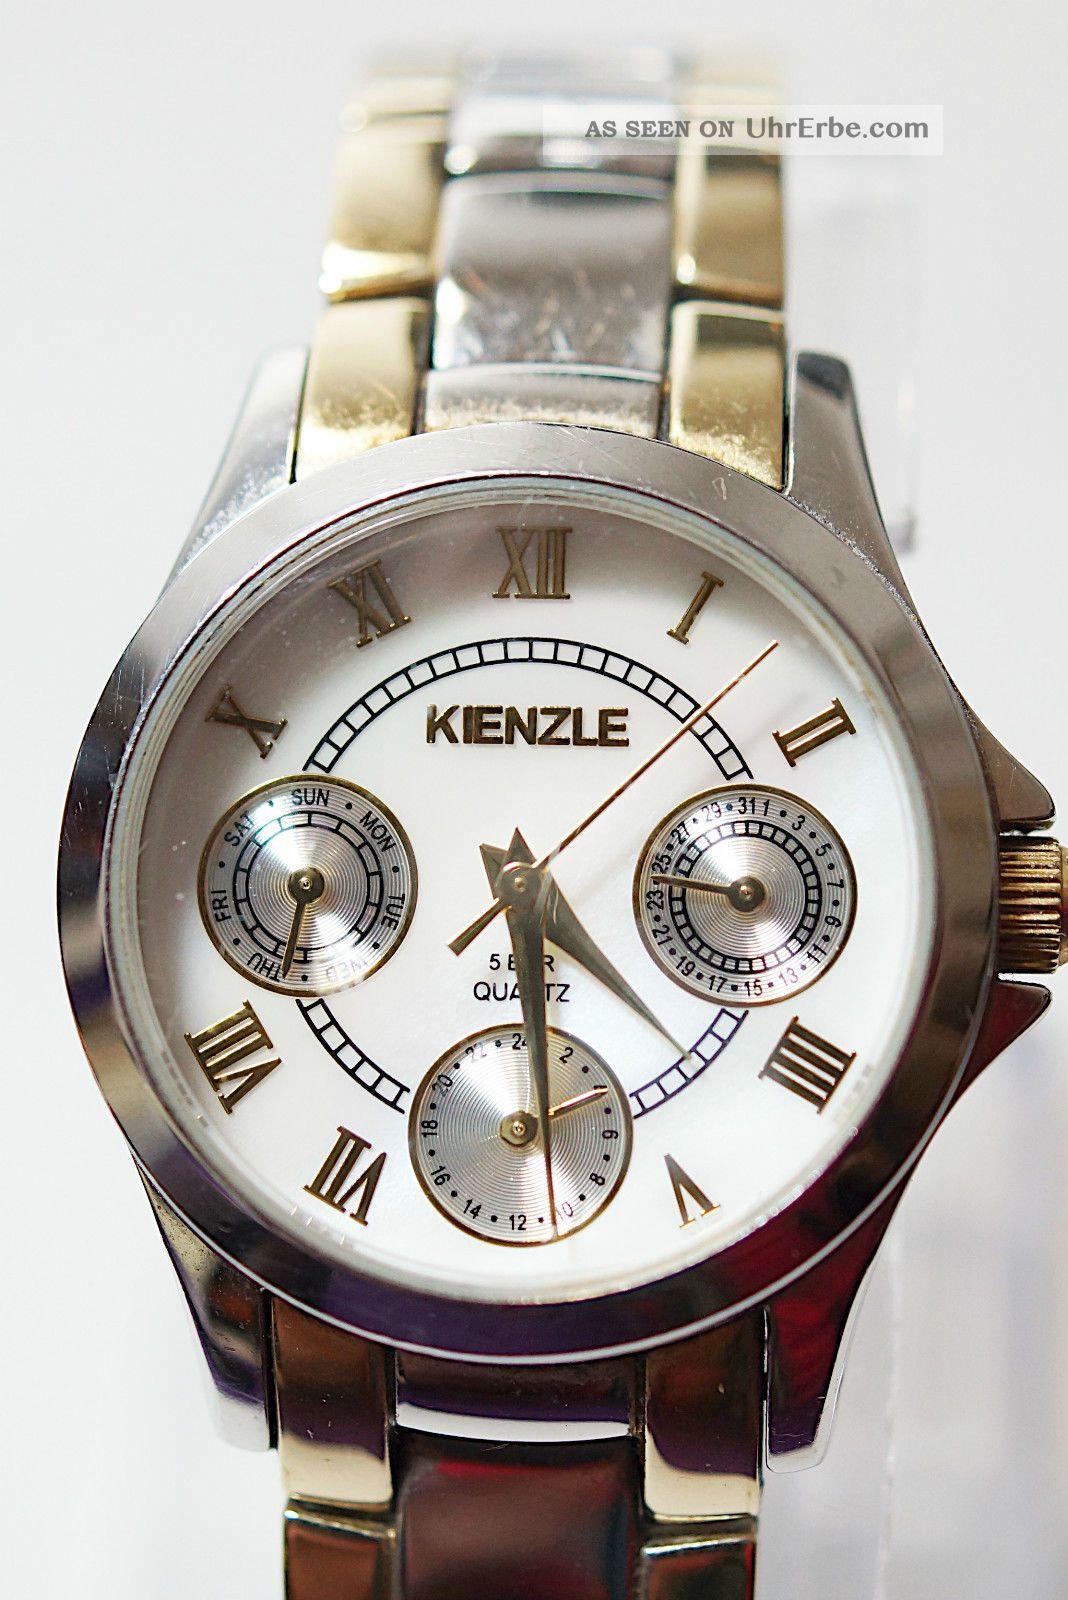 Kienzle 5 Bar Quarz Edelstahl Damenuhr Armband Römische Ziffern Armbanduhren Bild